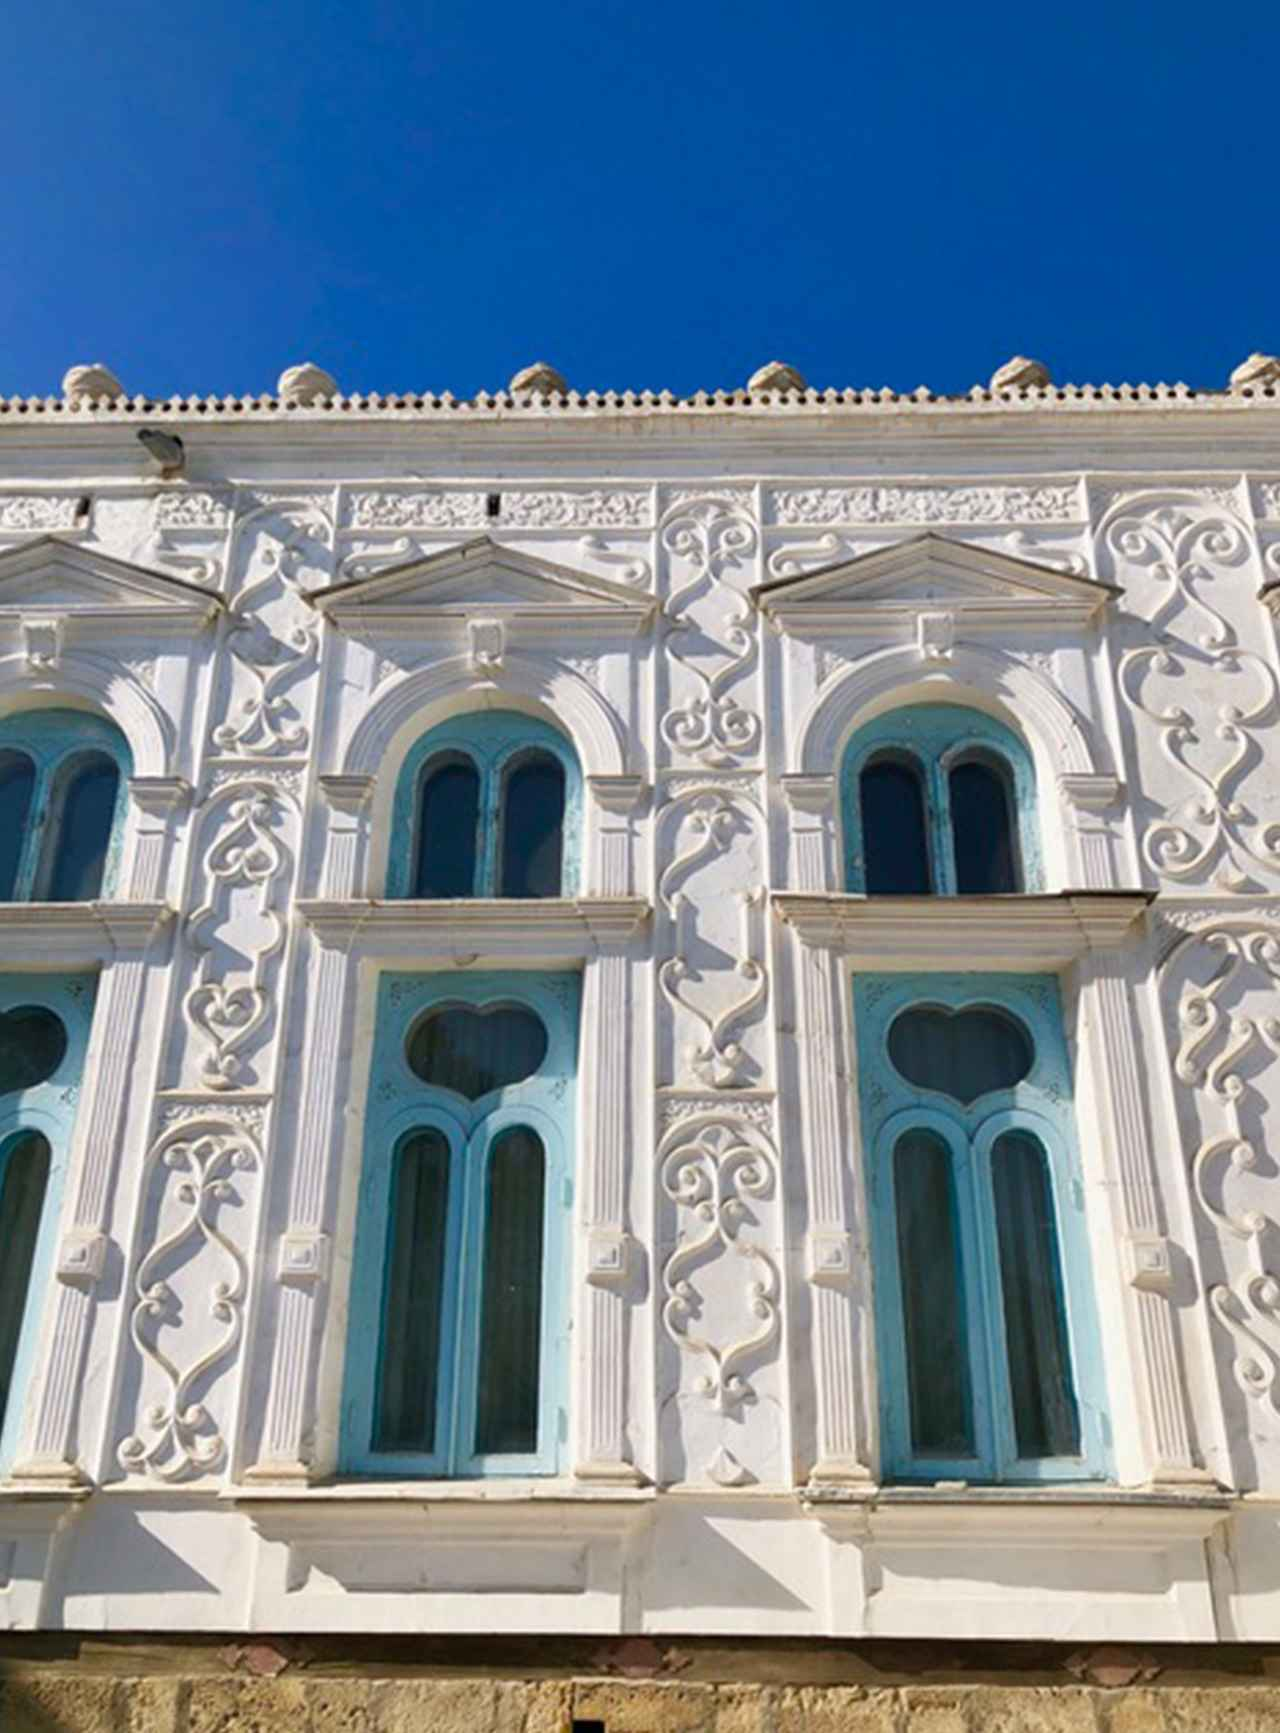 Images : 「スィトライ・マヒ・ホサ宮殿」の外観